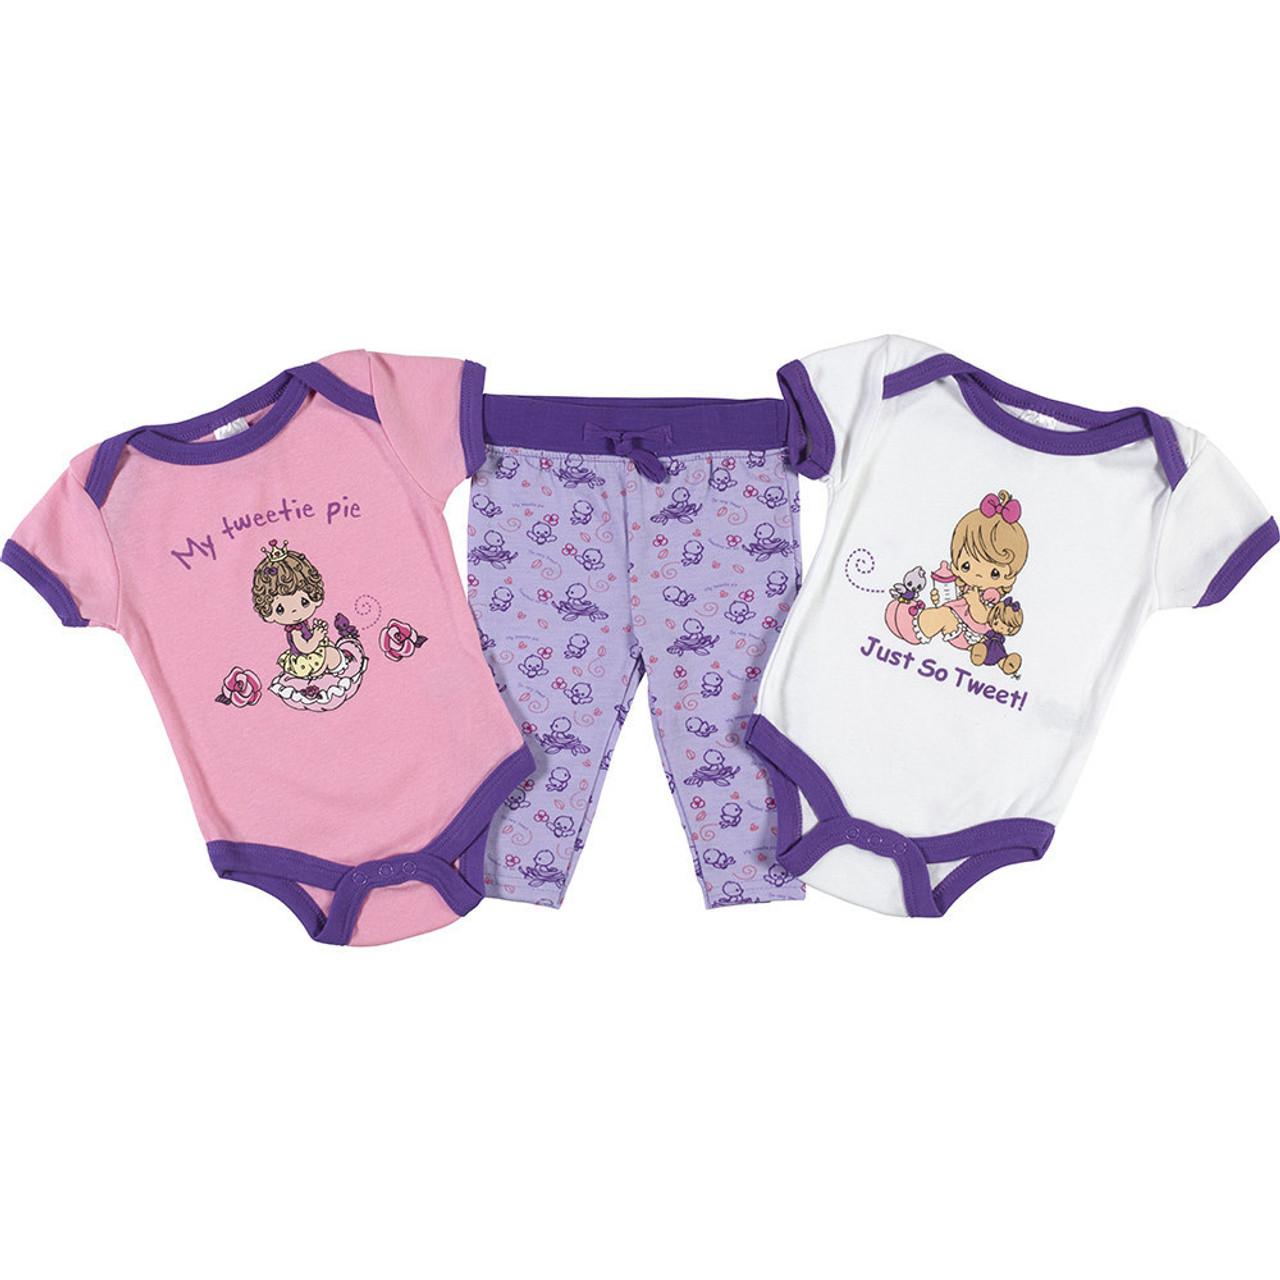 Disney Winnie the Pooh Baby Boys/' 3-Piece Layette Set